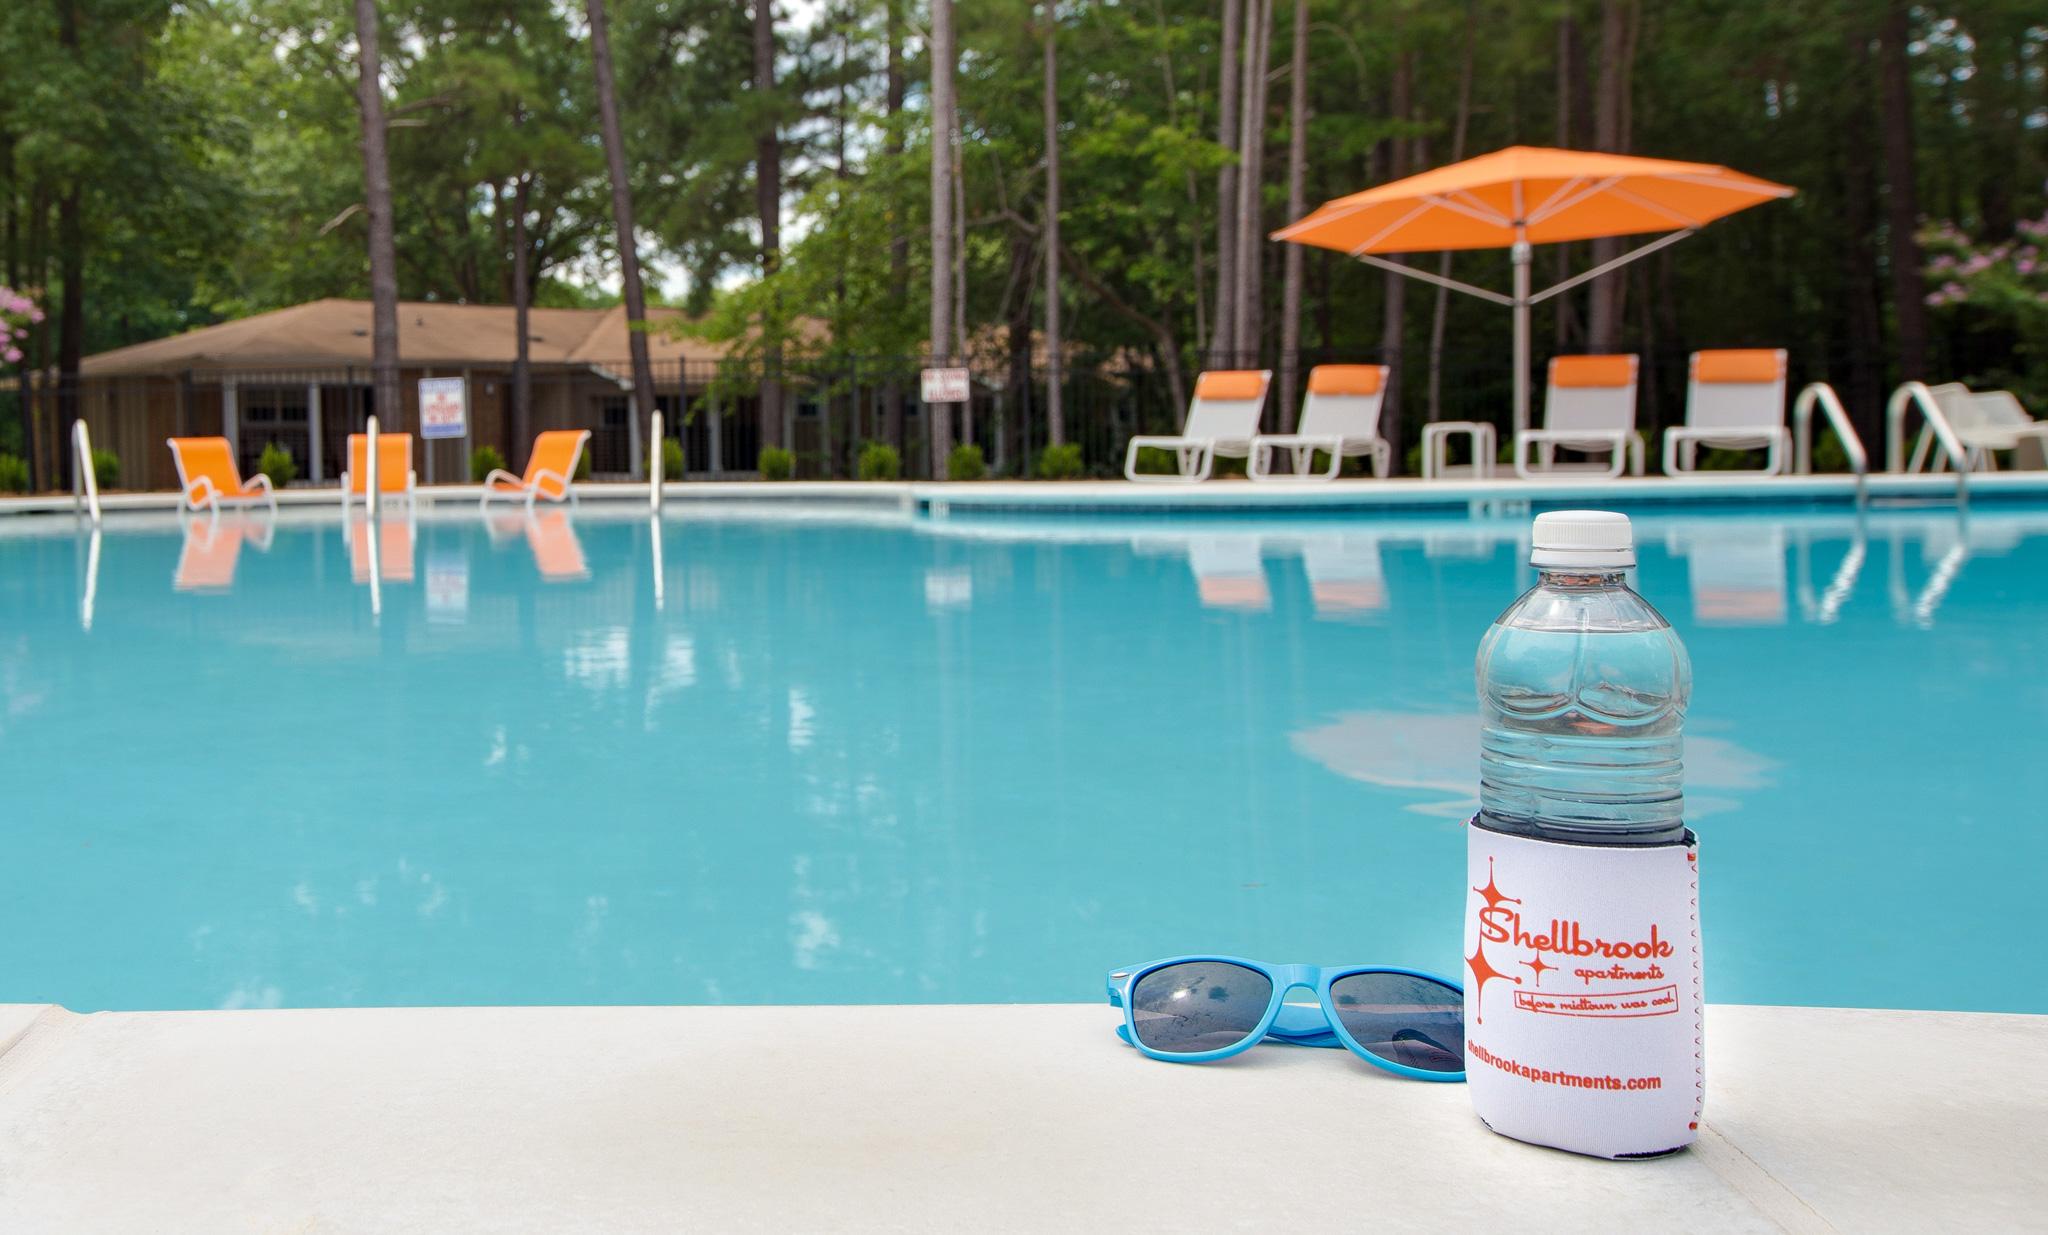 Shellbrook Pool